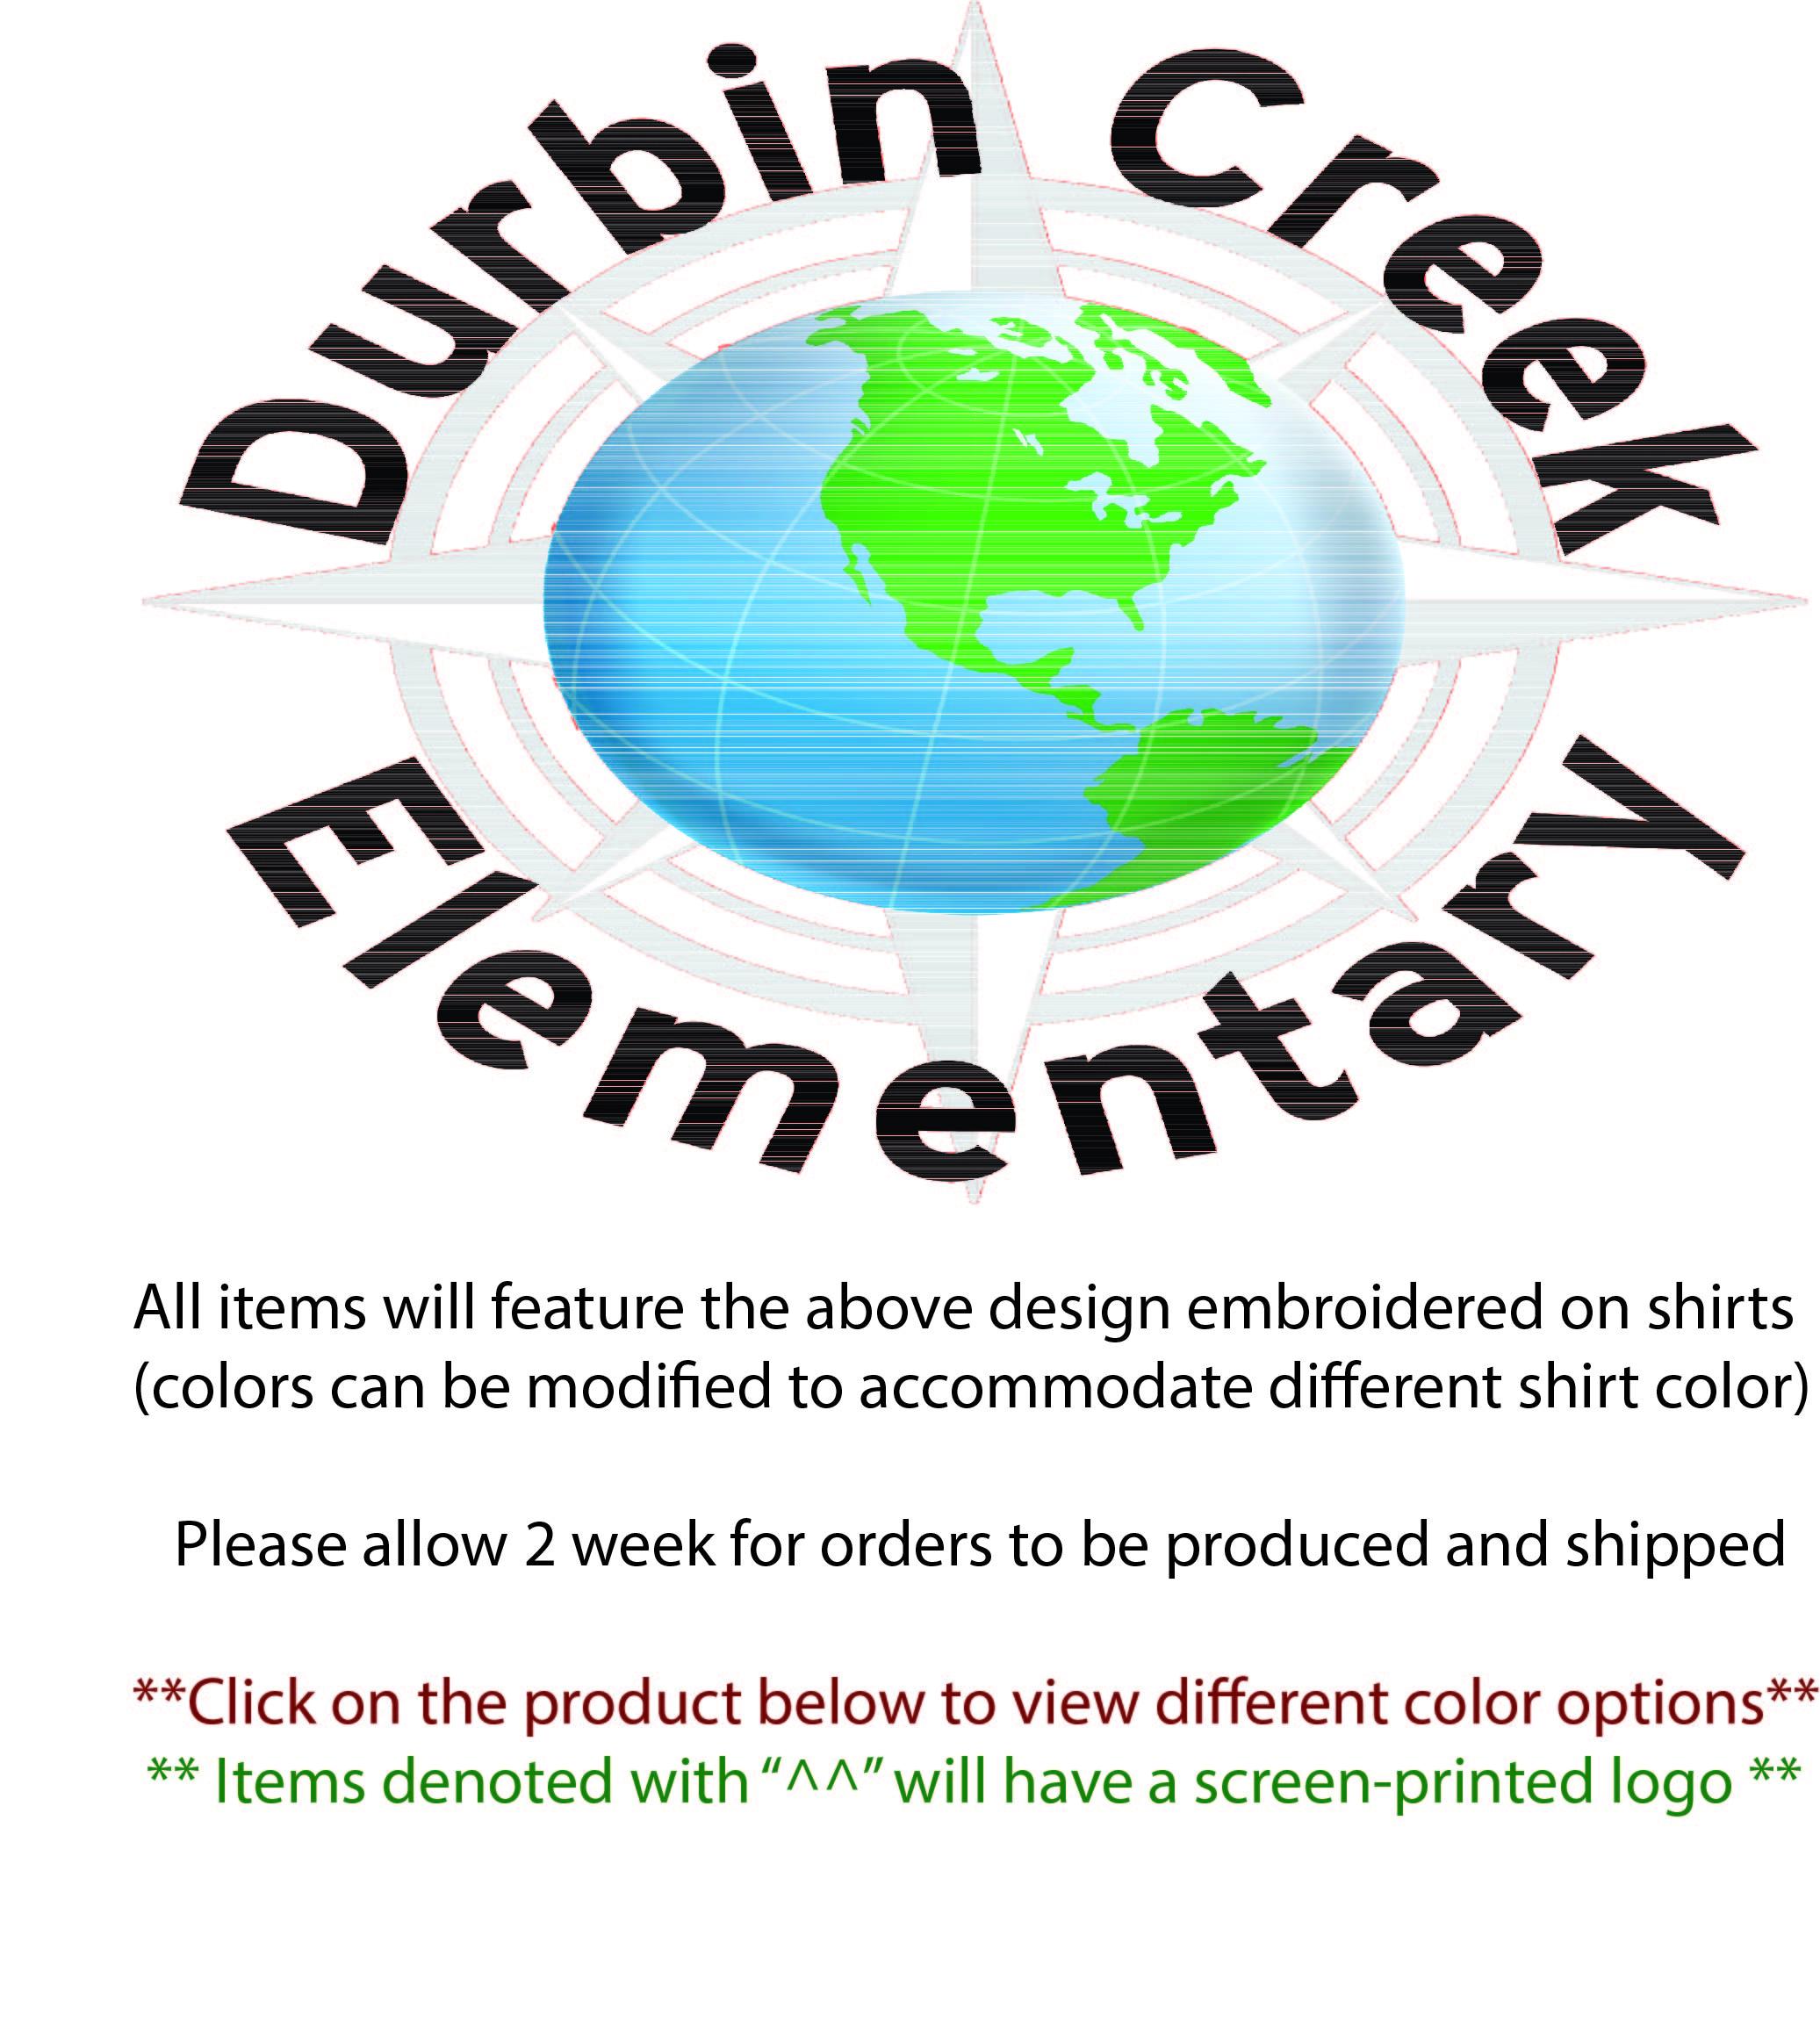 durbin-creek-web-site-header-staff.jpg